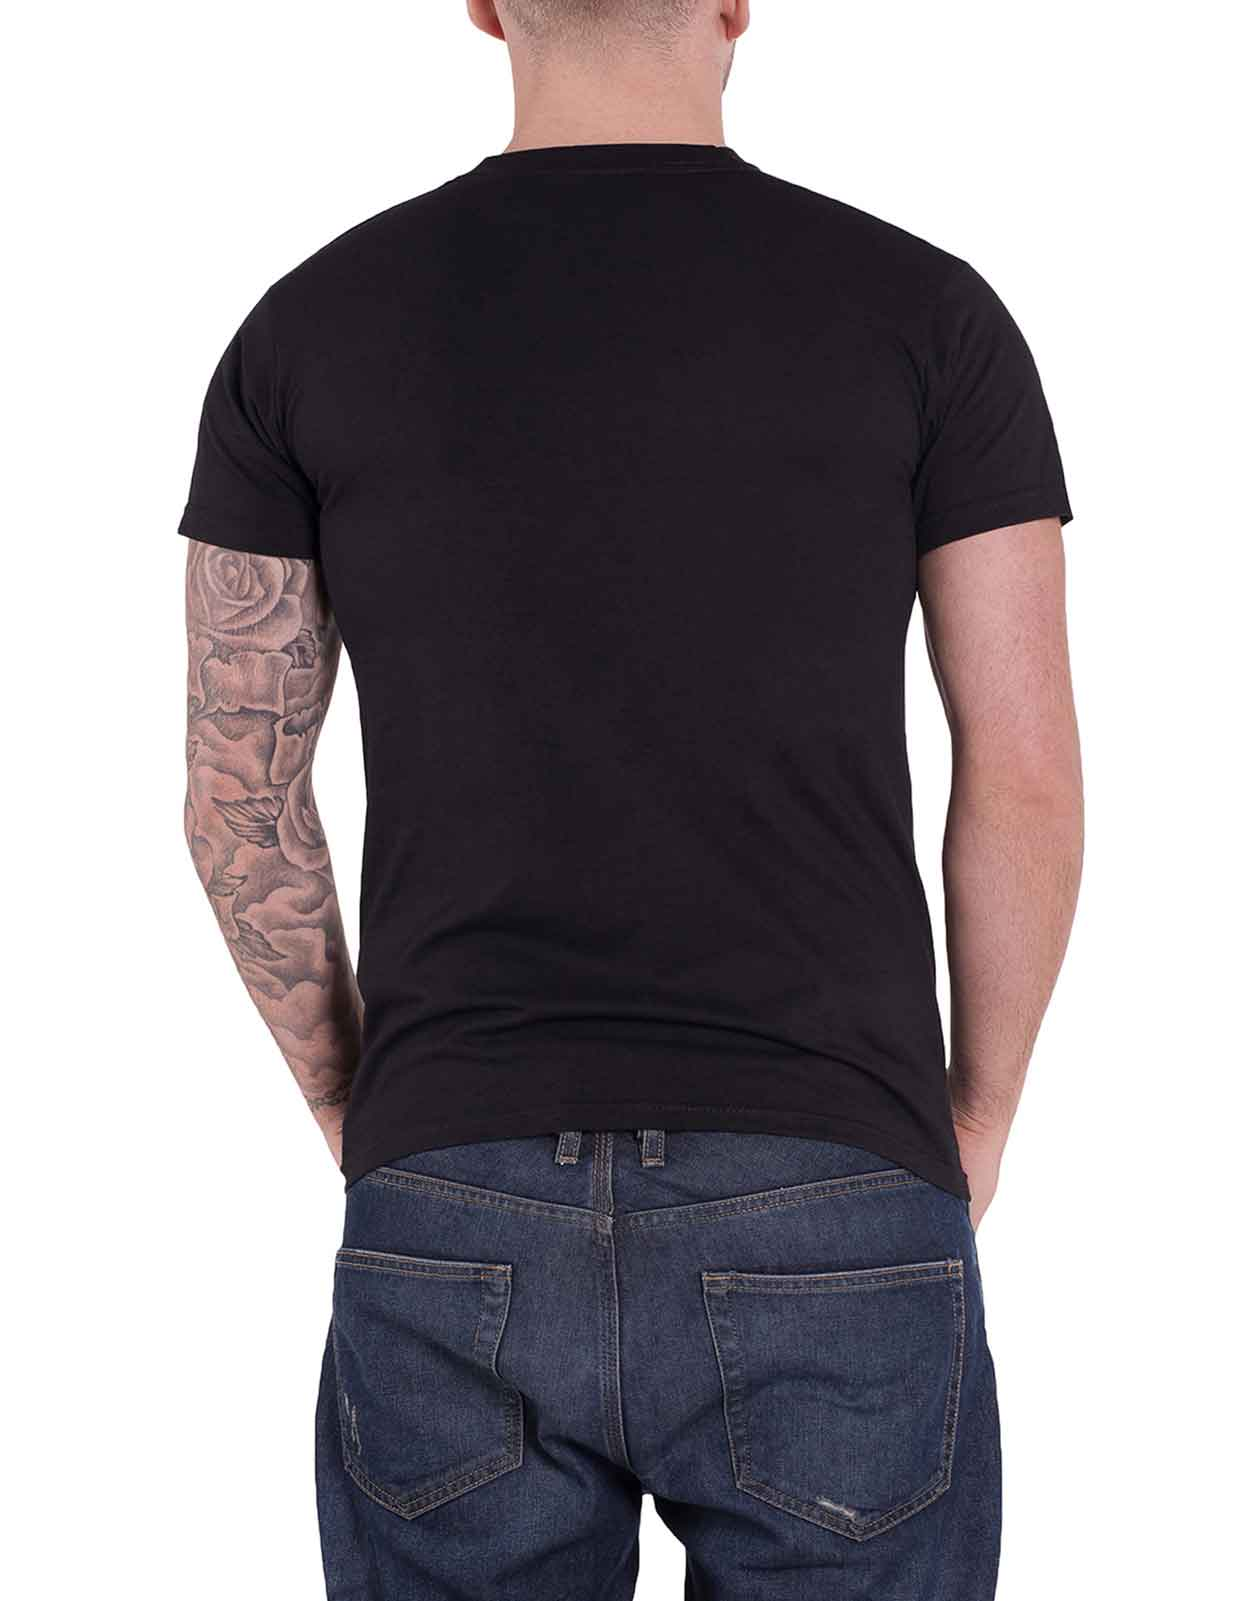 Misfits-T-Shirt-Official-fiend-Skull-Band-Logo-Die-Die-My-Darling-Mens-New thumbnail 19